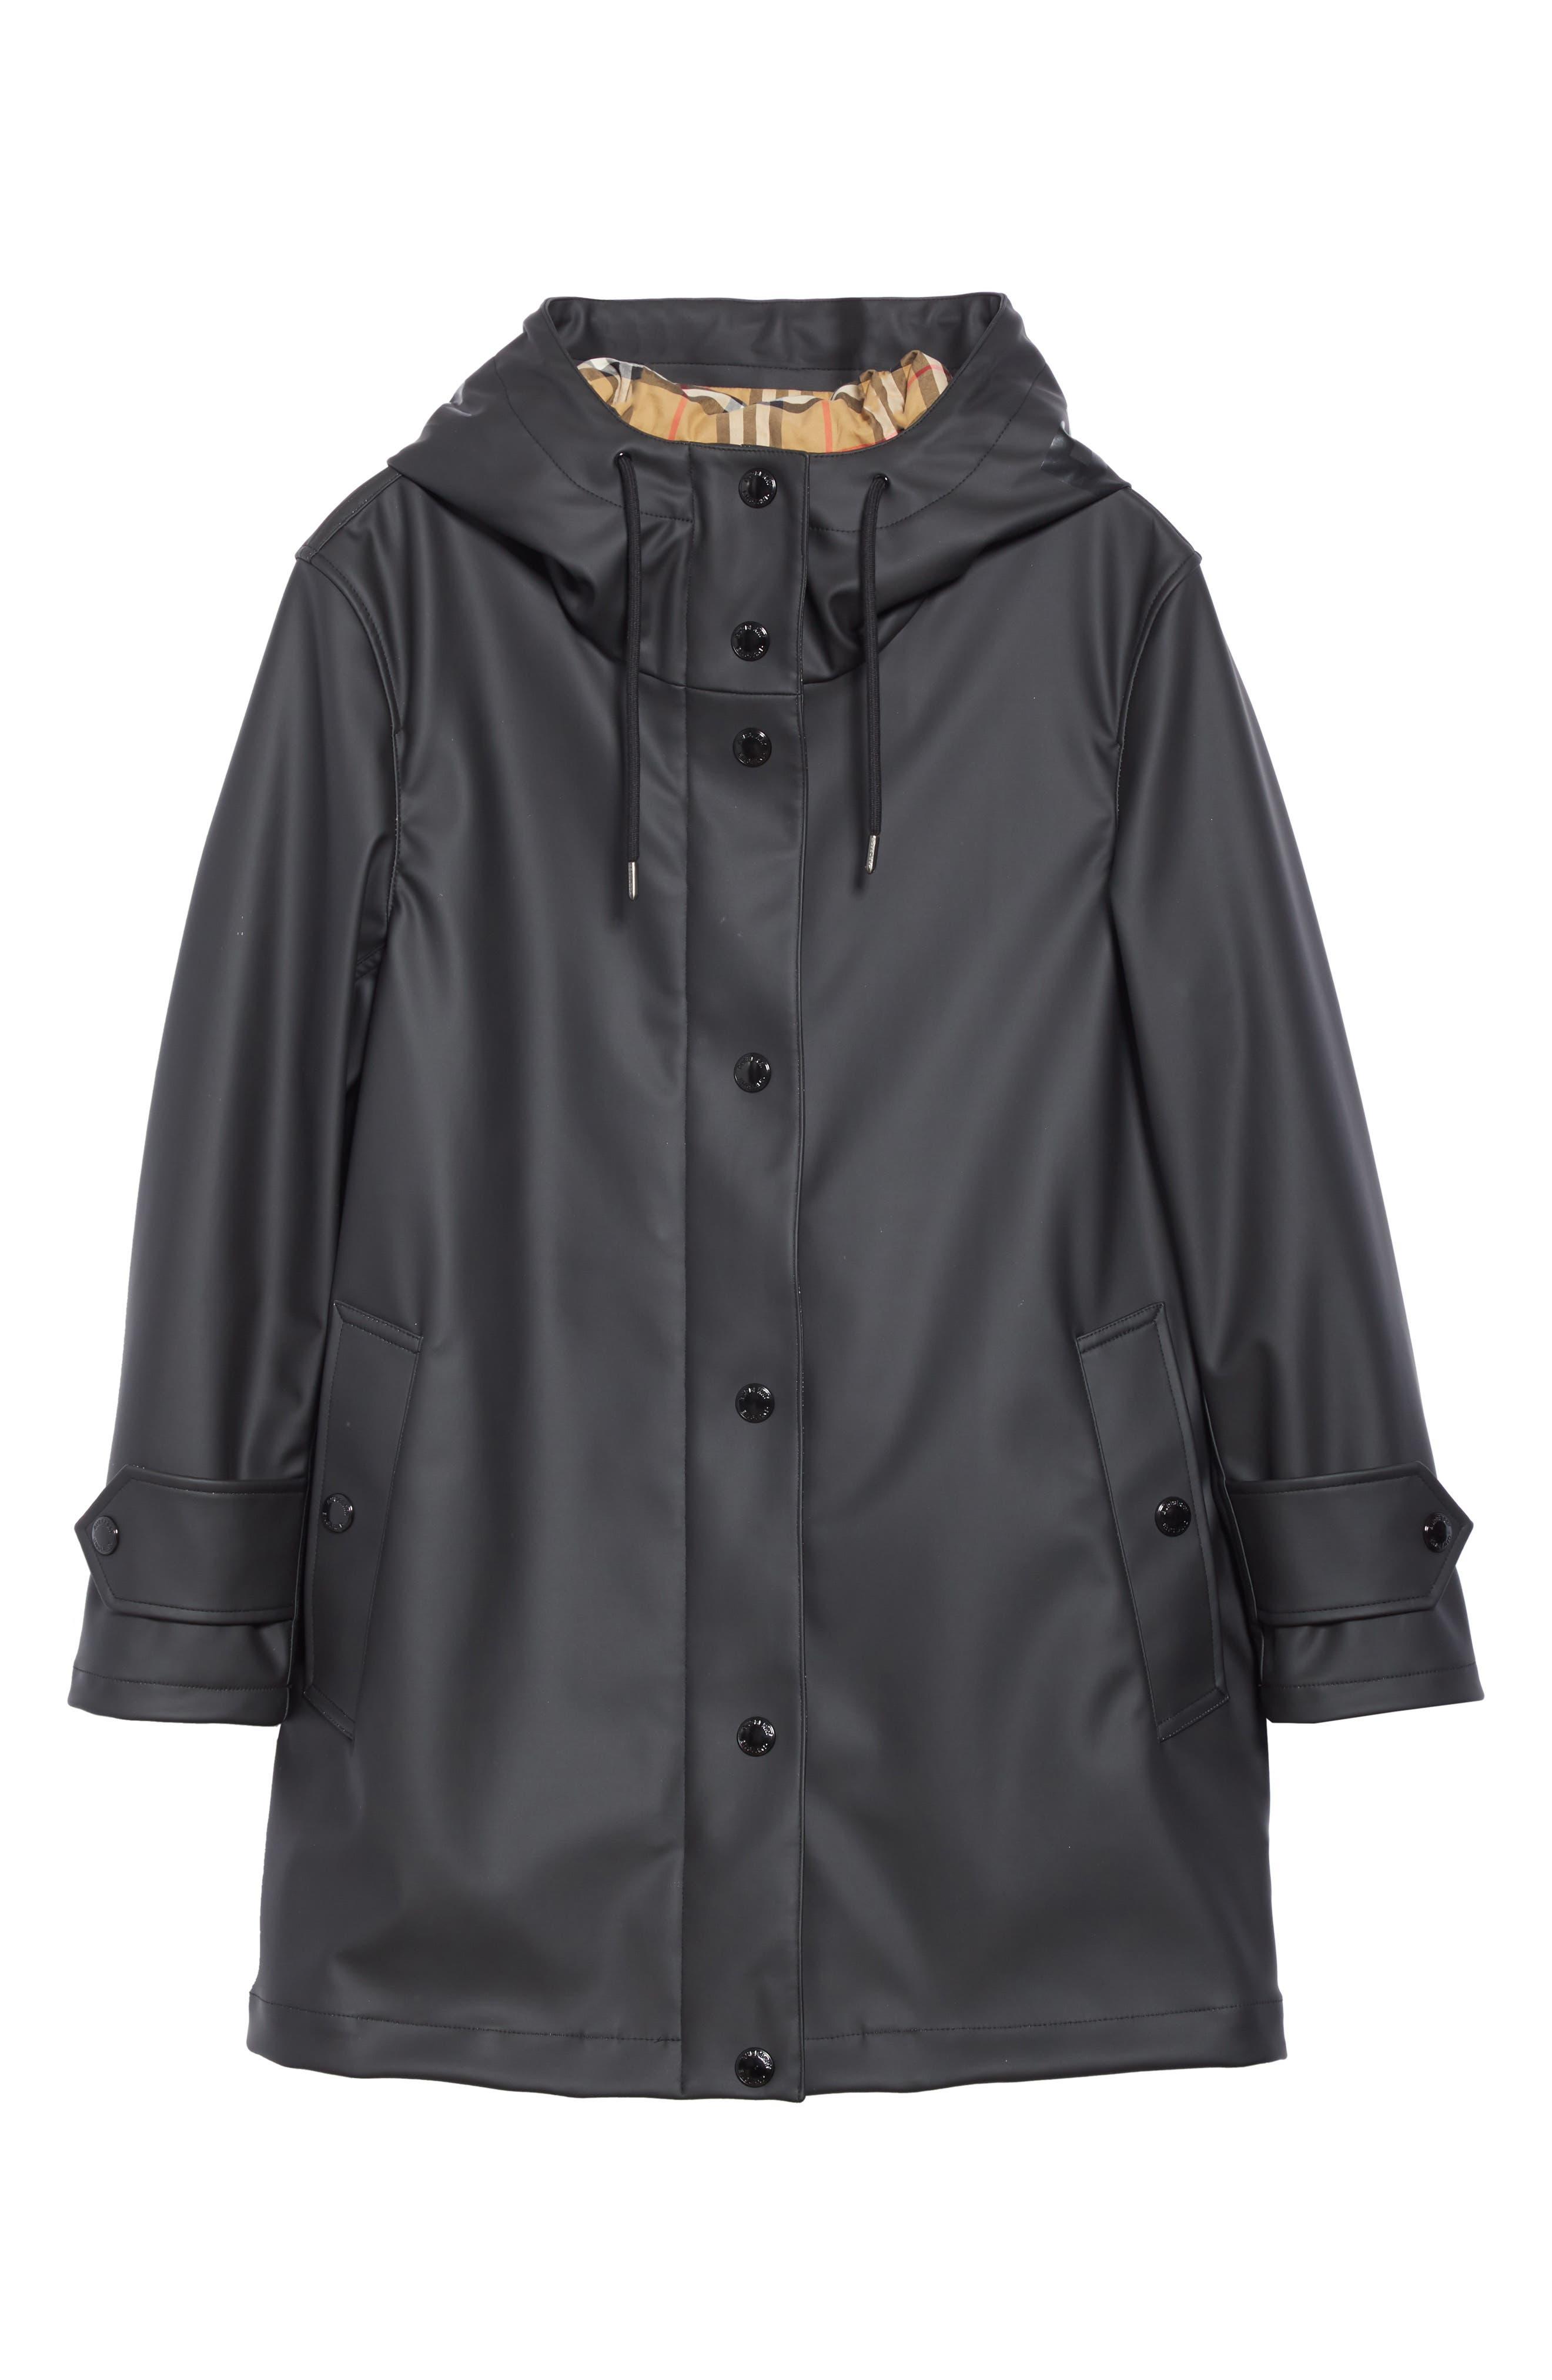 BURBERRY, Hartlebury Coated Rain Coat, Alternate thumbnail 5, color, BLACK / WHITE